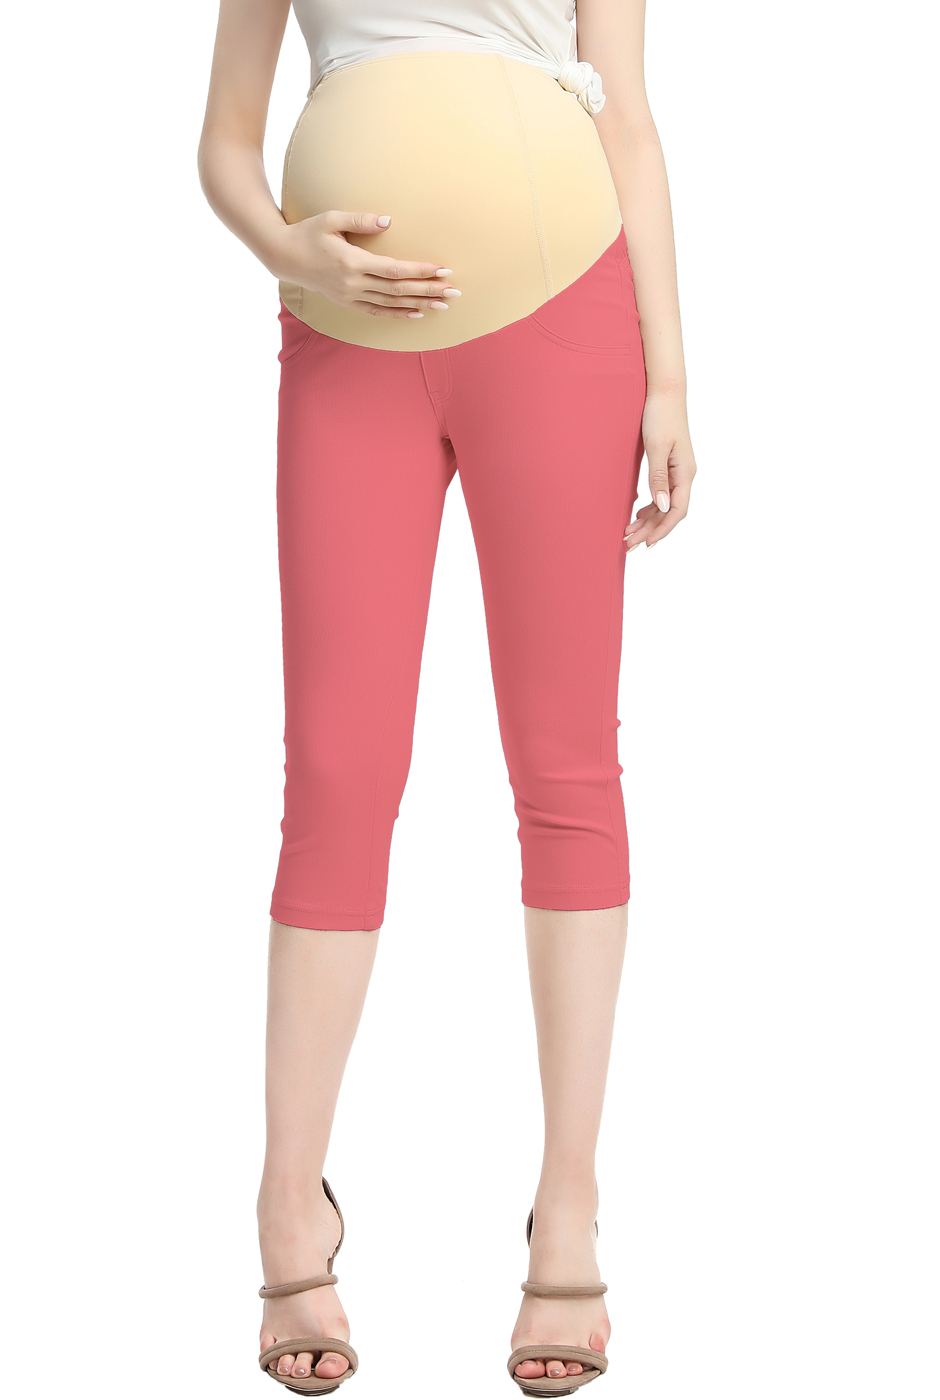 Maternity Women's Capri Jeggings - Coral M